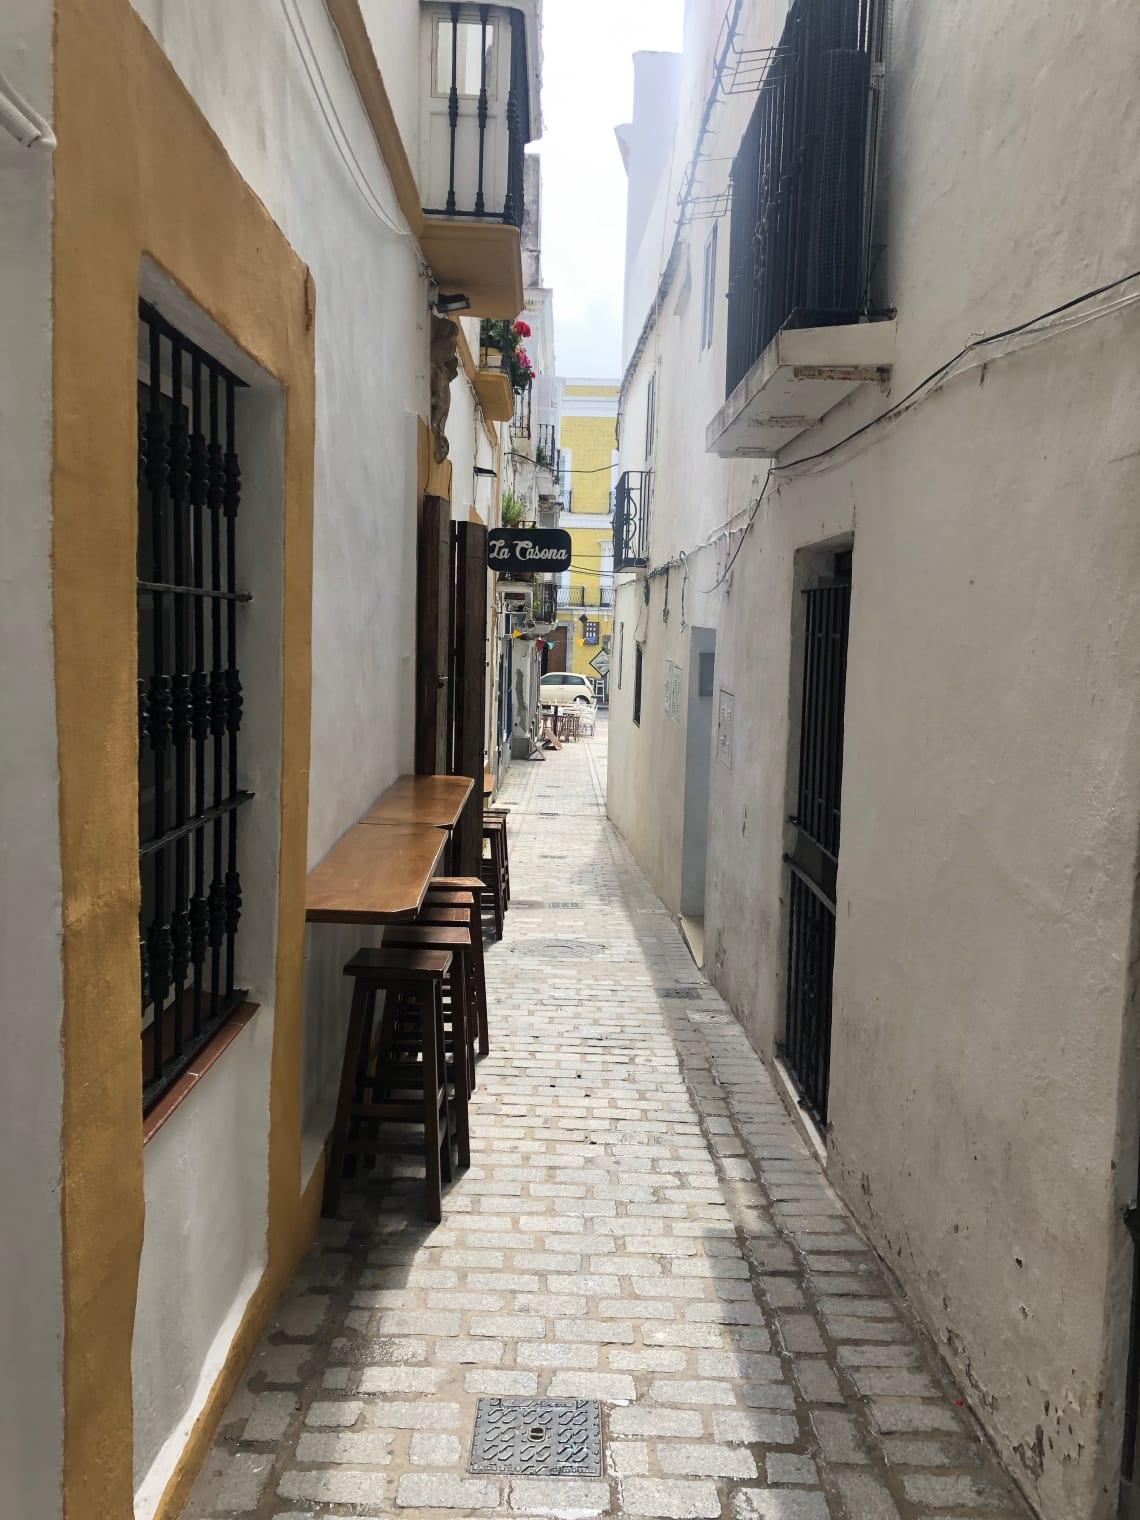 Guía completa para viajar a Tarifa - worldpackers - calles de Tarifa